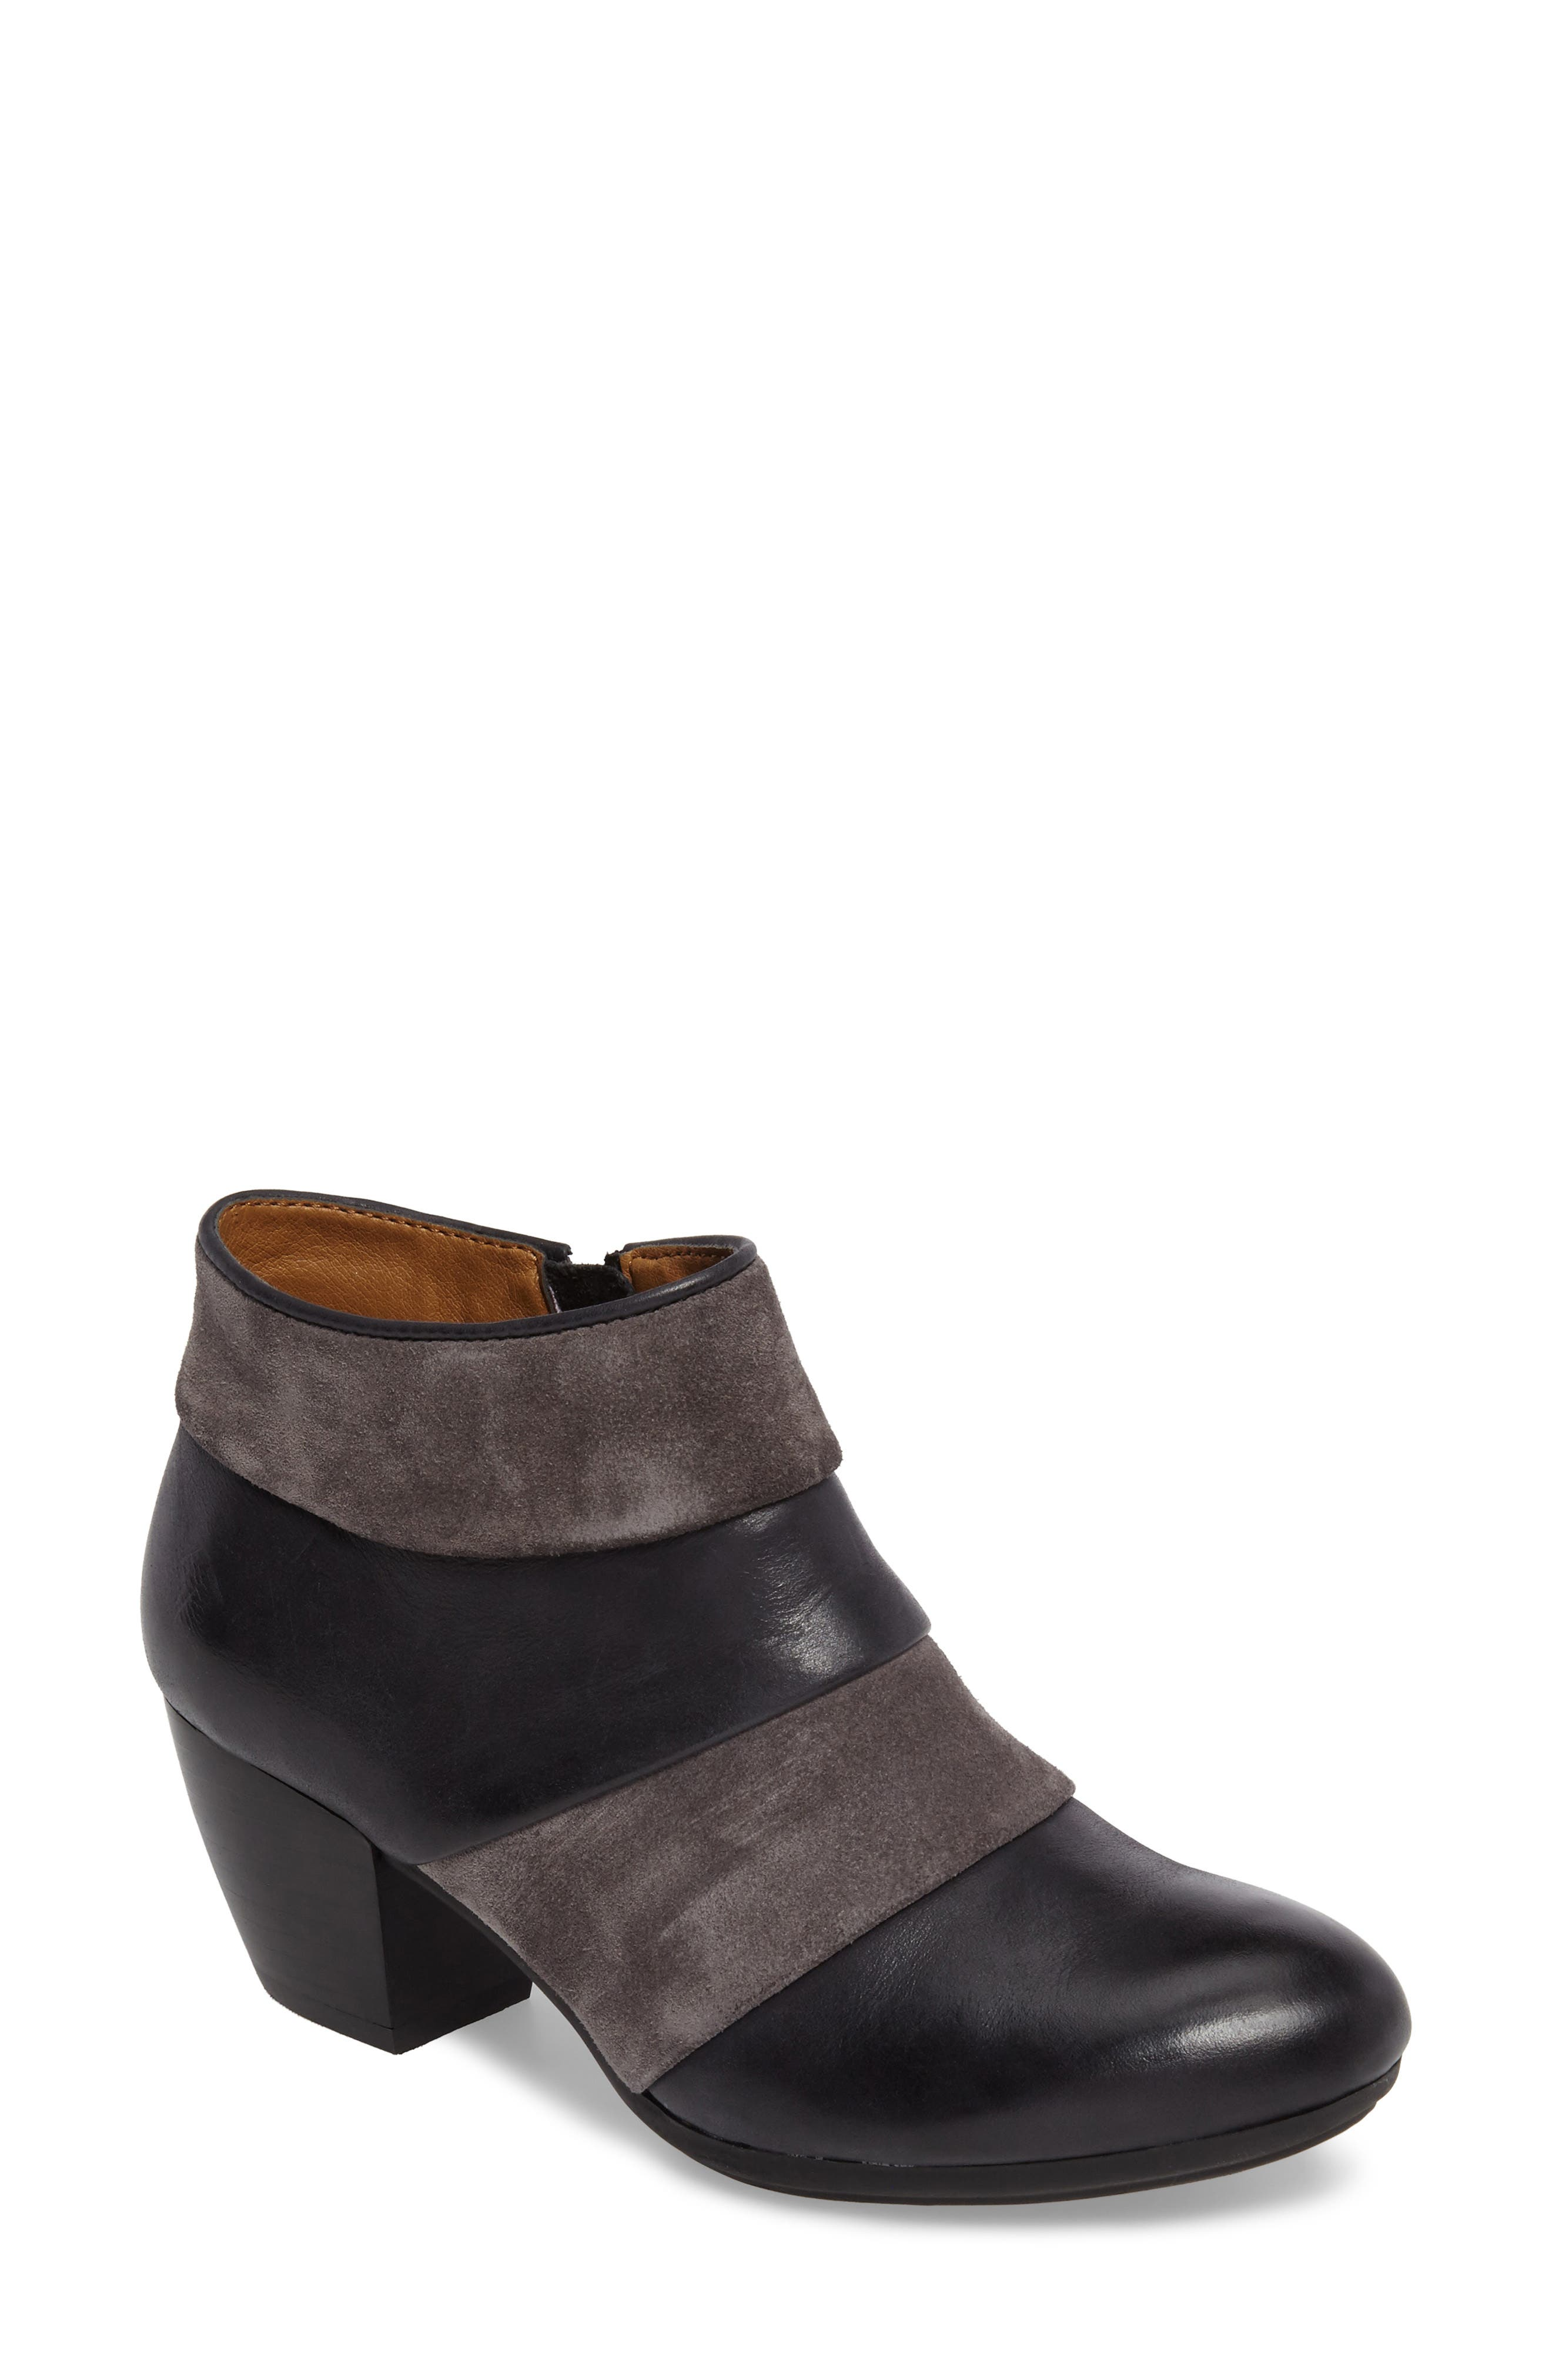 Amesbury Colorblock Bootie,                         Main,                         color, Black/ Steel Grey Leather